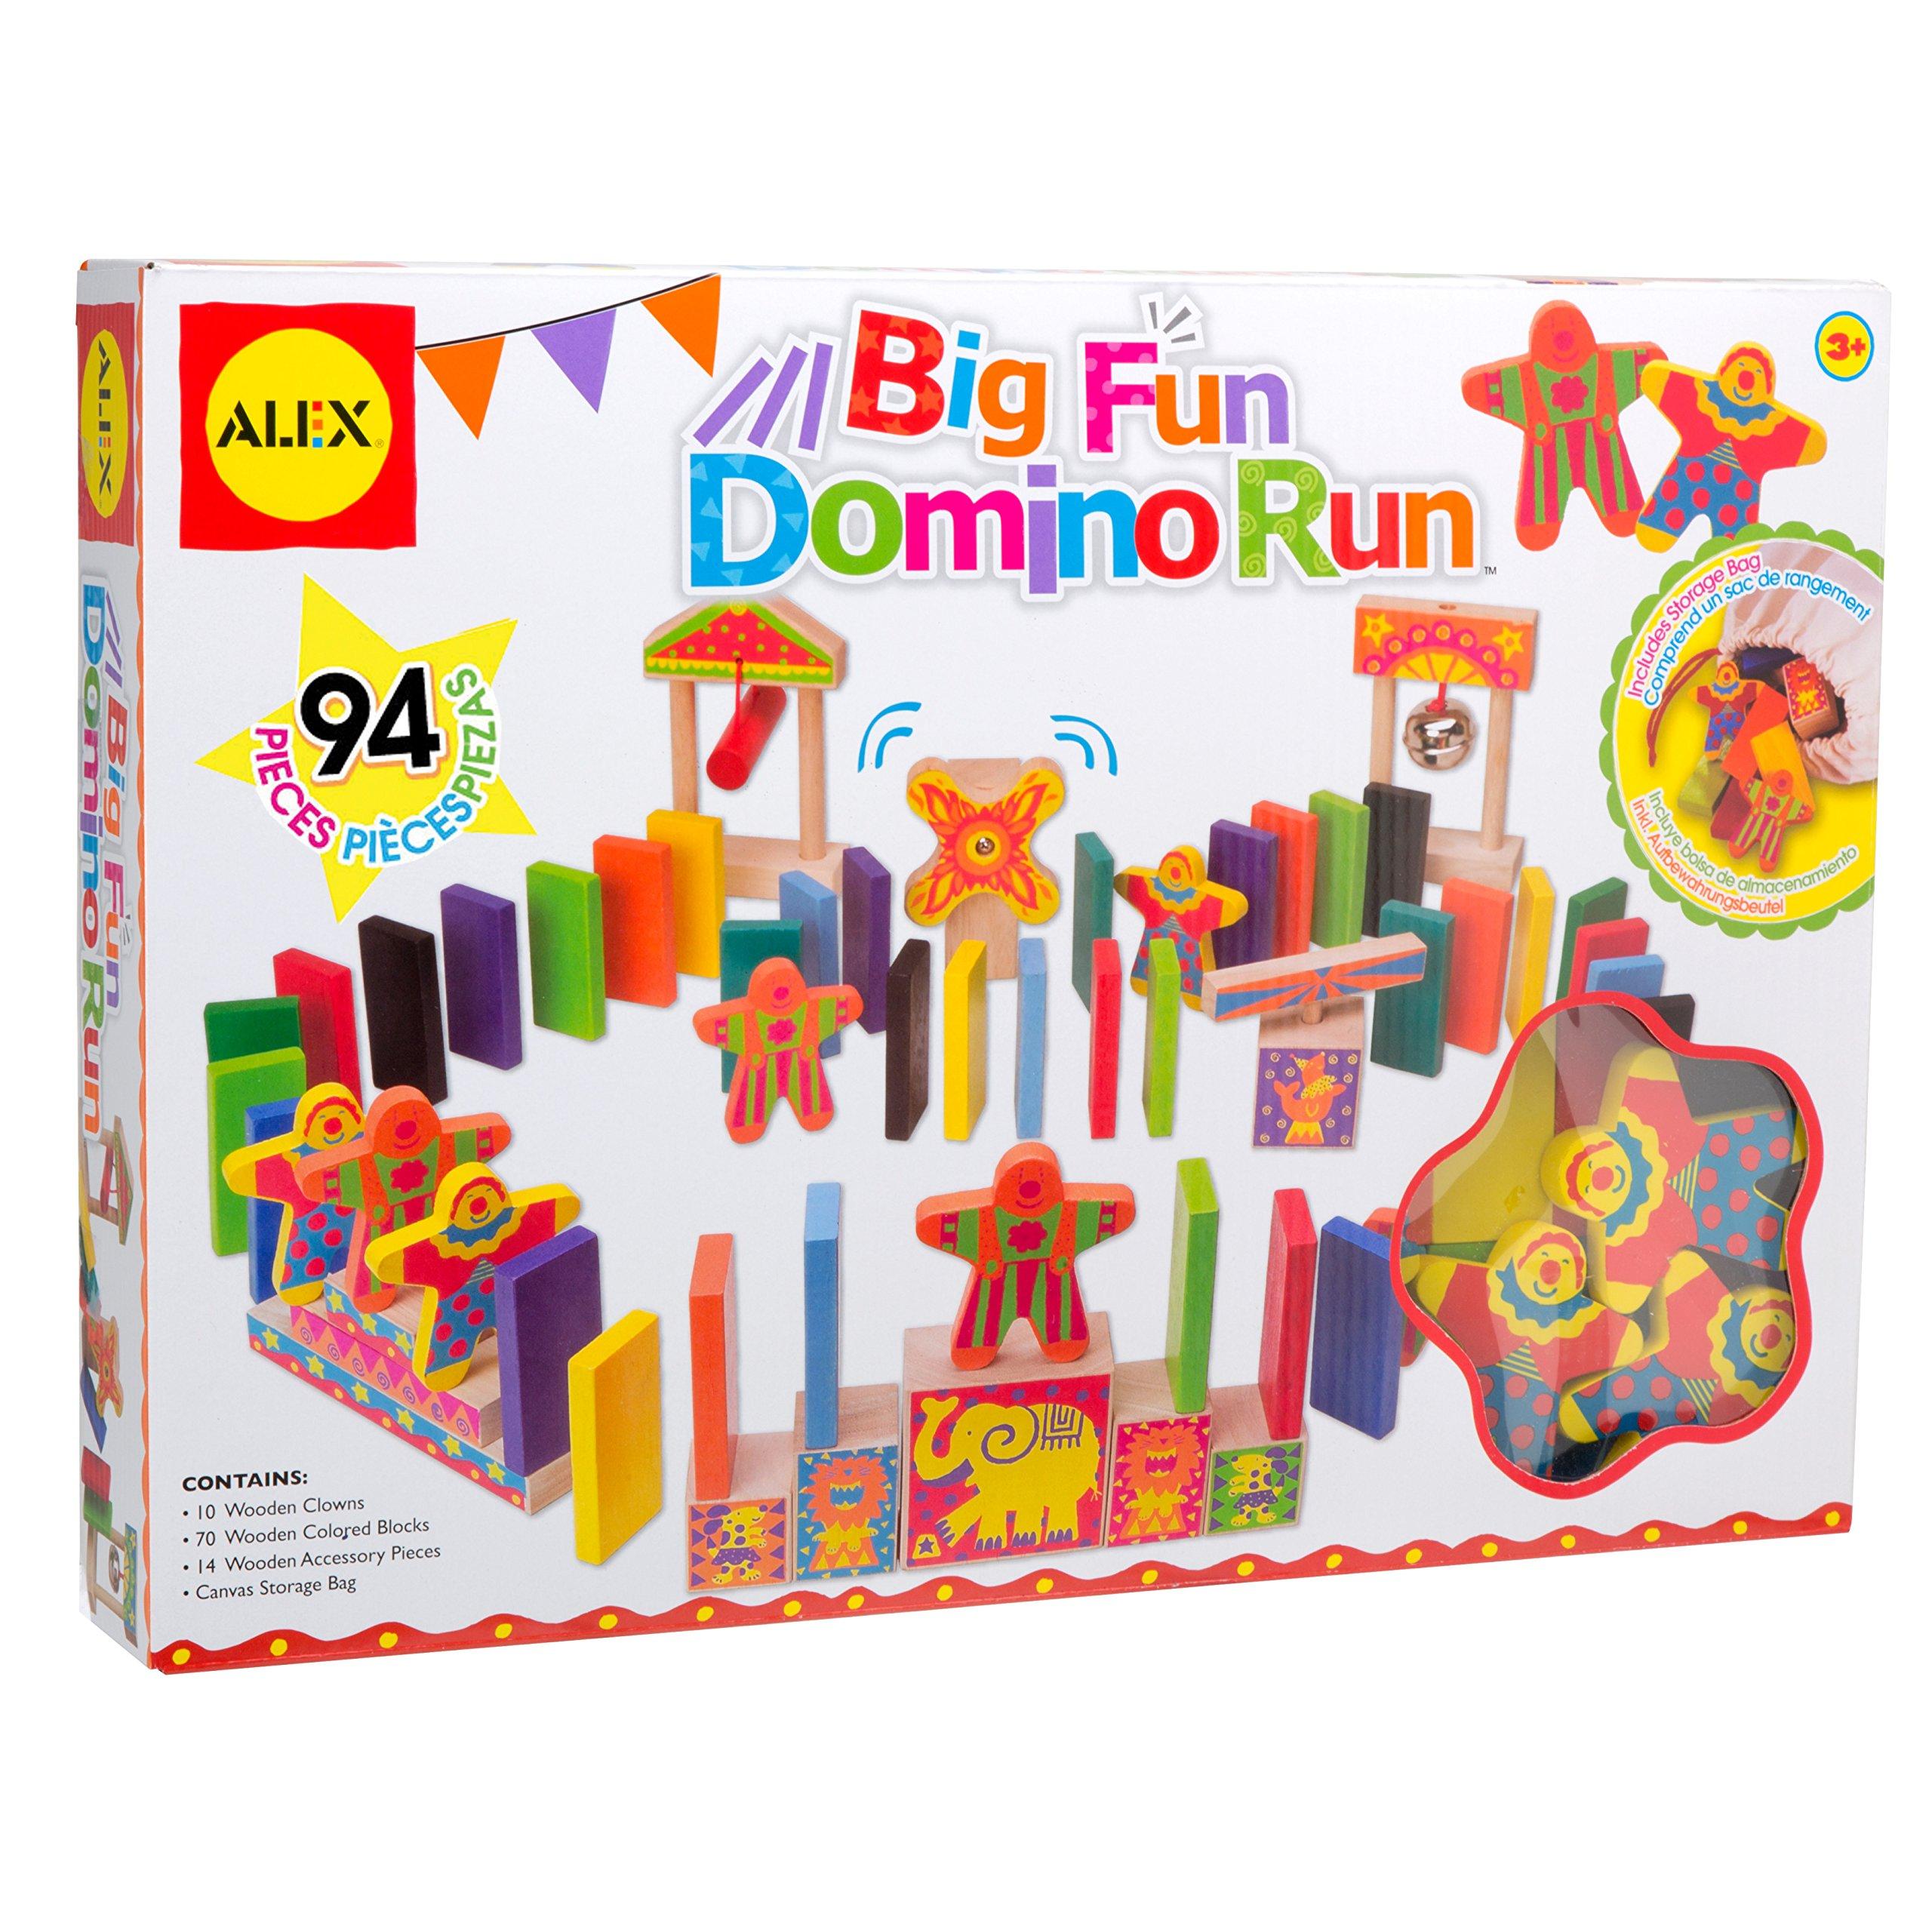 ALEX Toys Big Fun Domino Run 94pc